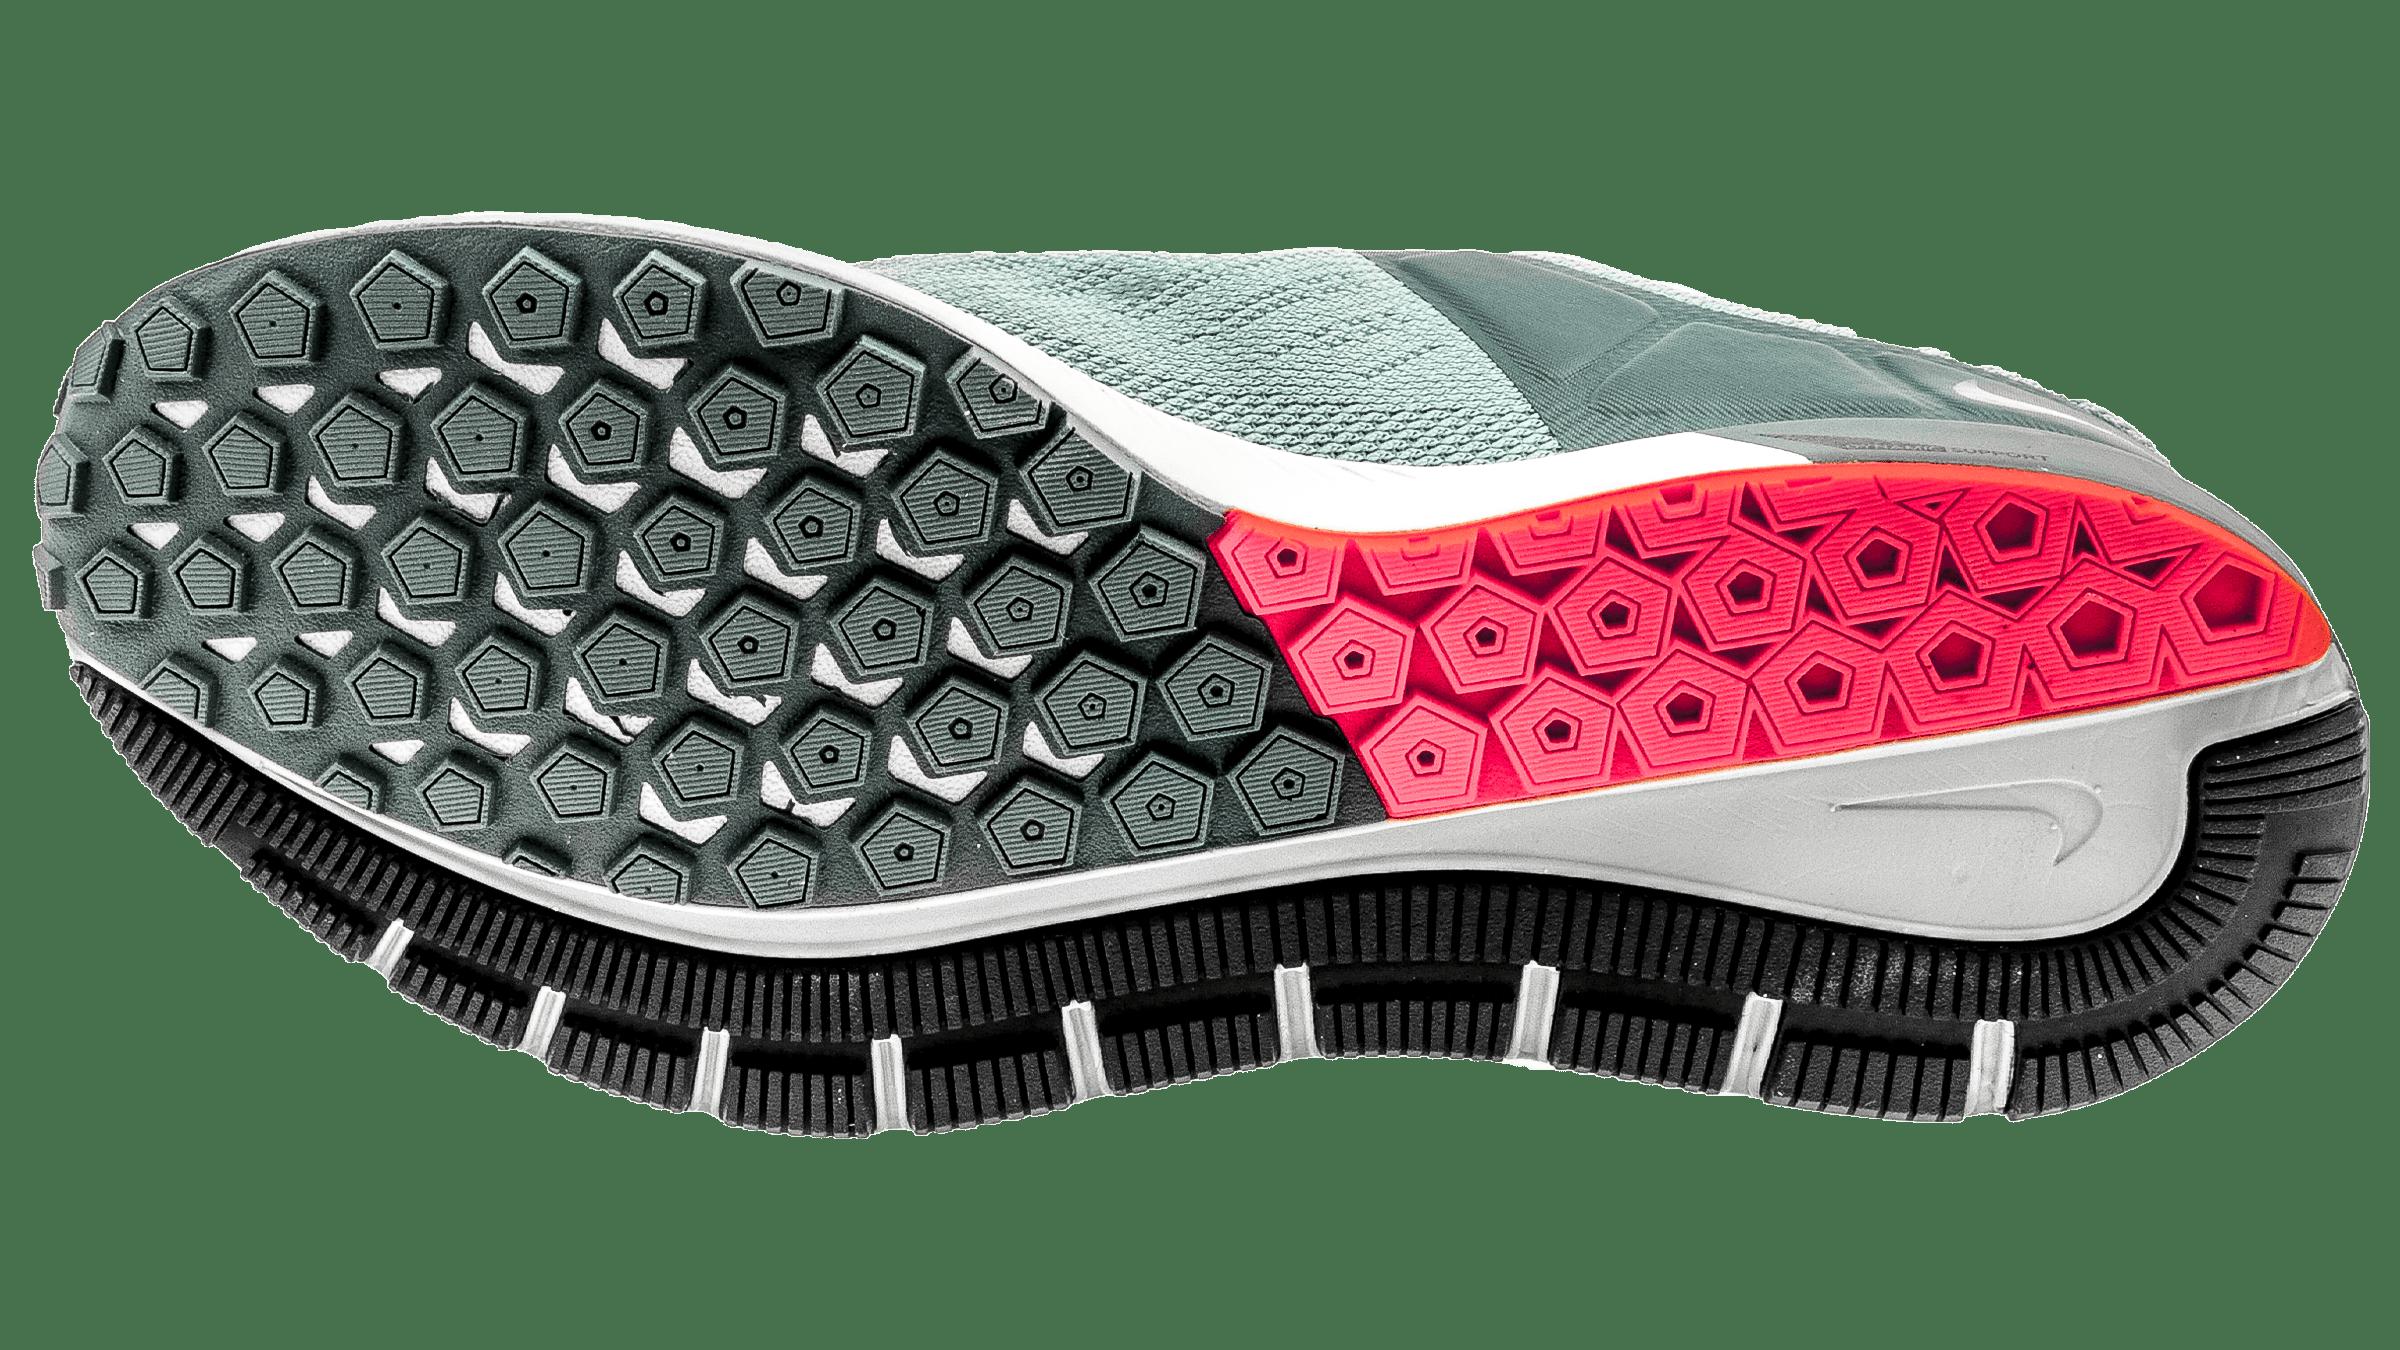 f98a56e8b50 Nike Air Zoom Structure 22 obsidian mist/bright crimson bestellen ...